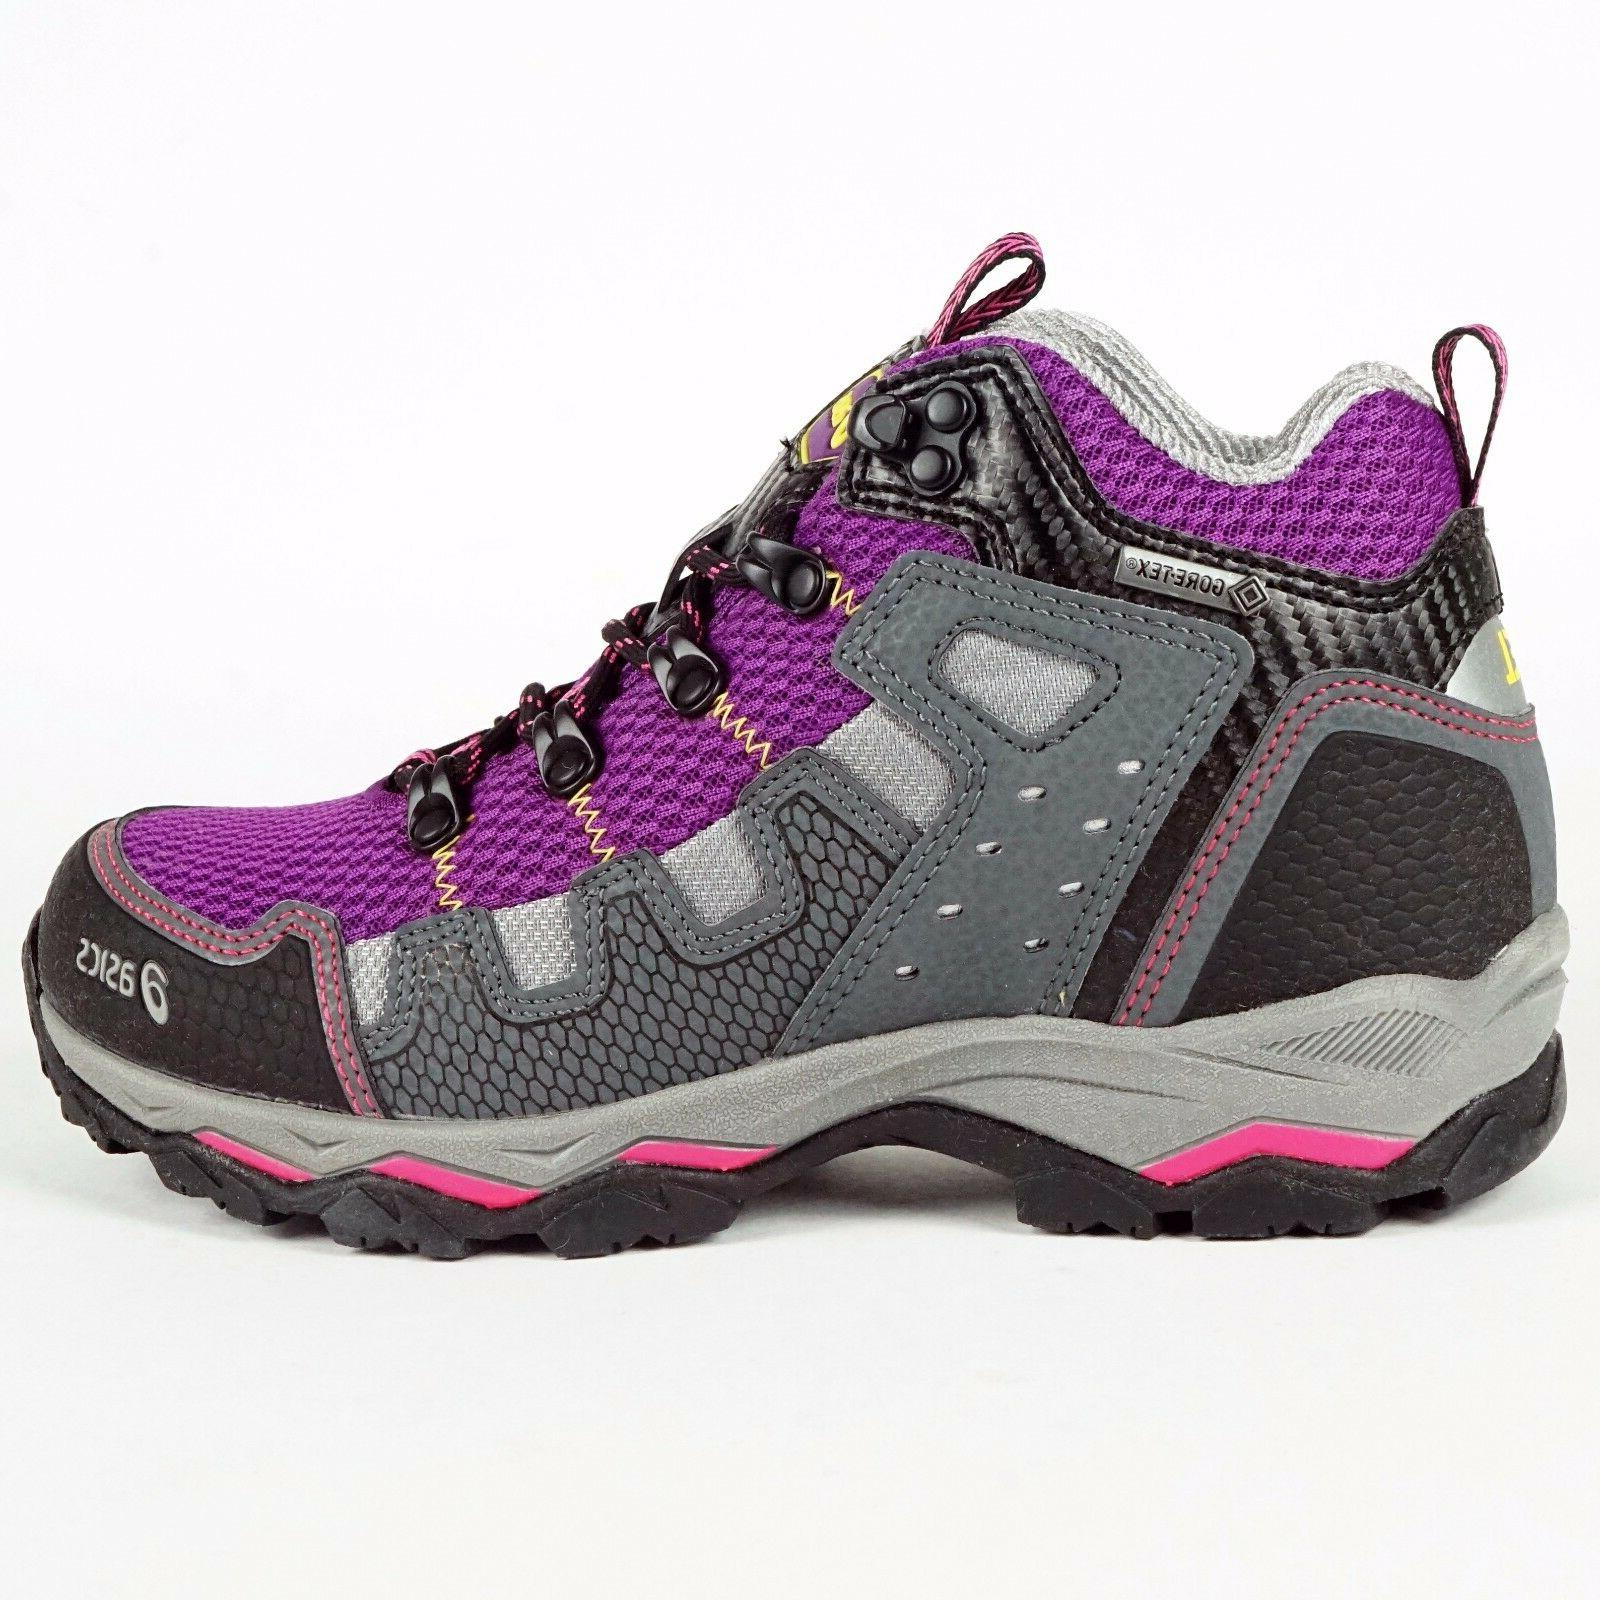 Asics Womens GEL-MONTALTO Gore-tex Mid Sports Trekking Trail